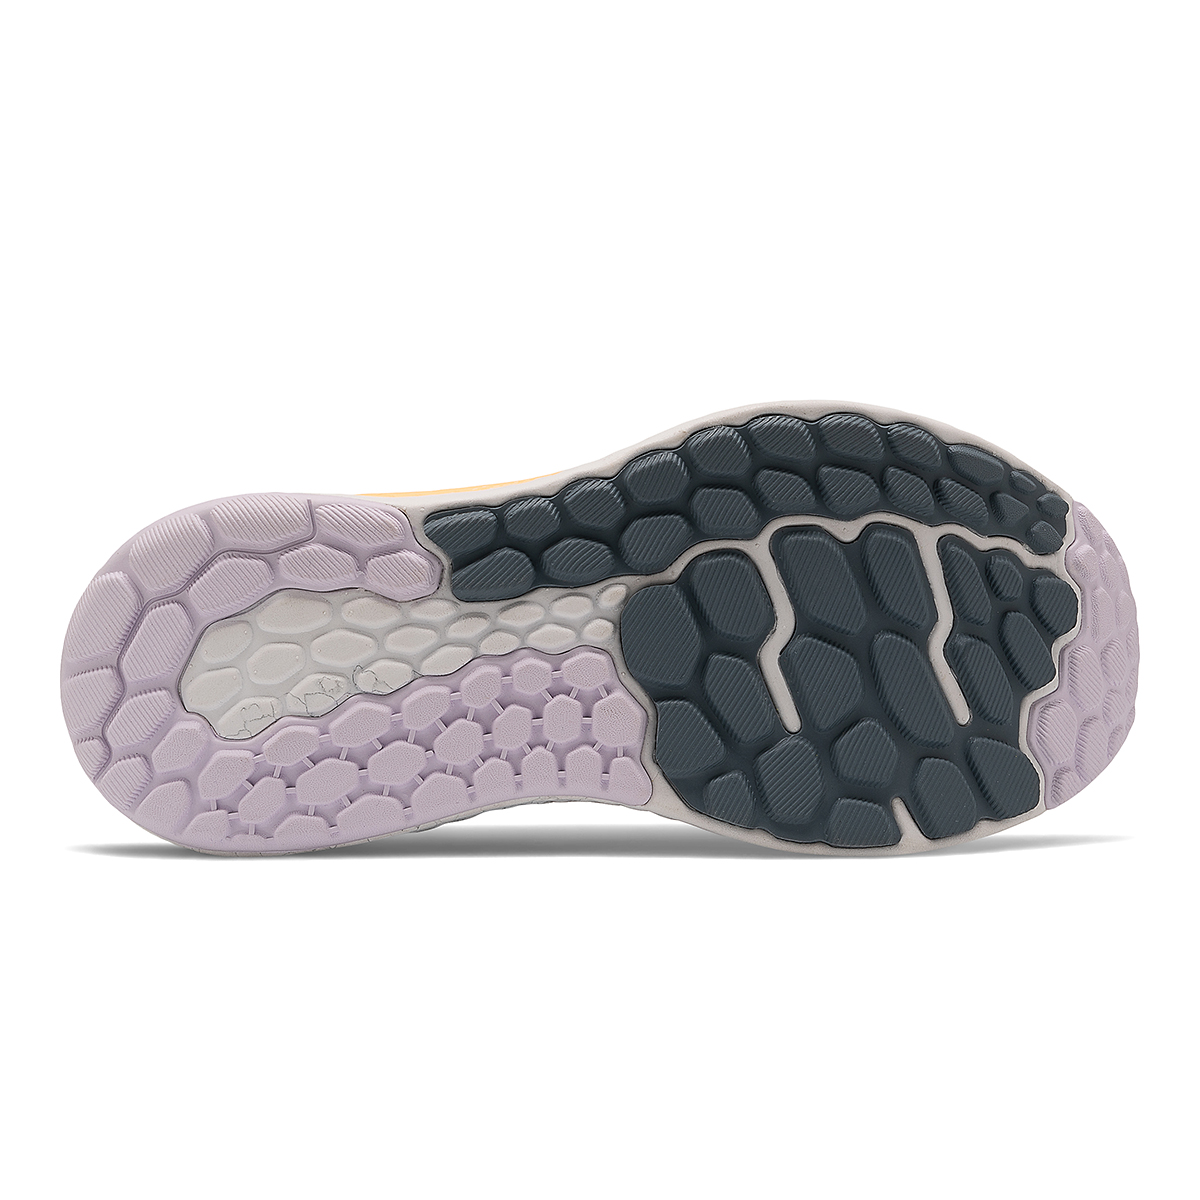 Women's New Balance Fresh Foam Vongo V5 Running Shoe - Color: White/Light Mango - Size: 5 - Width: Regular, White/Light Mango, large, image 5